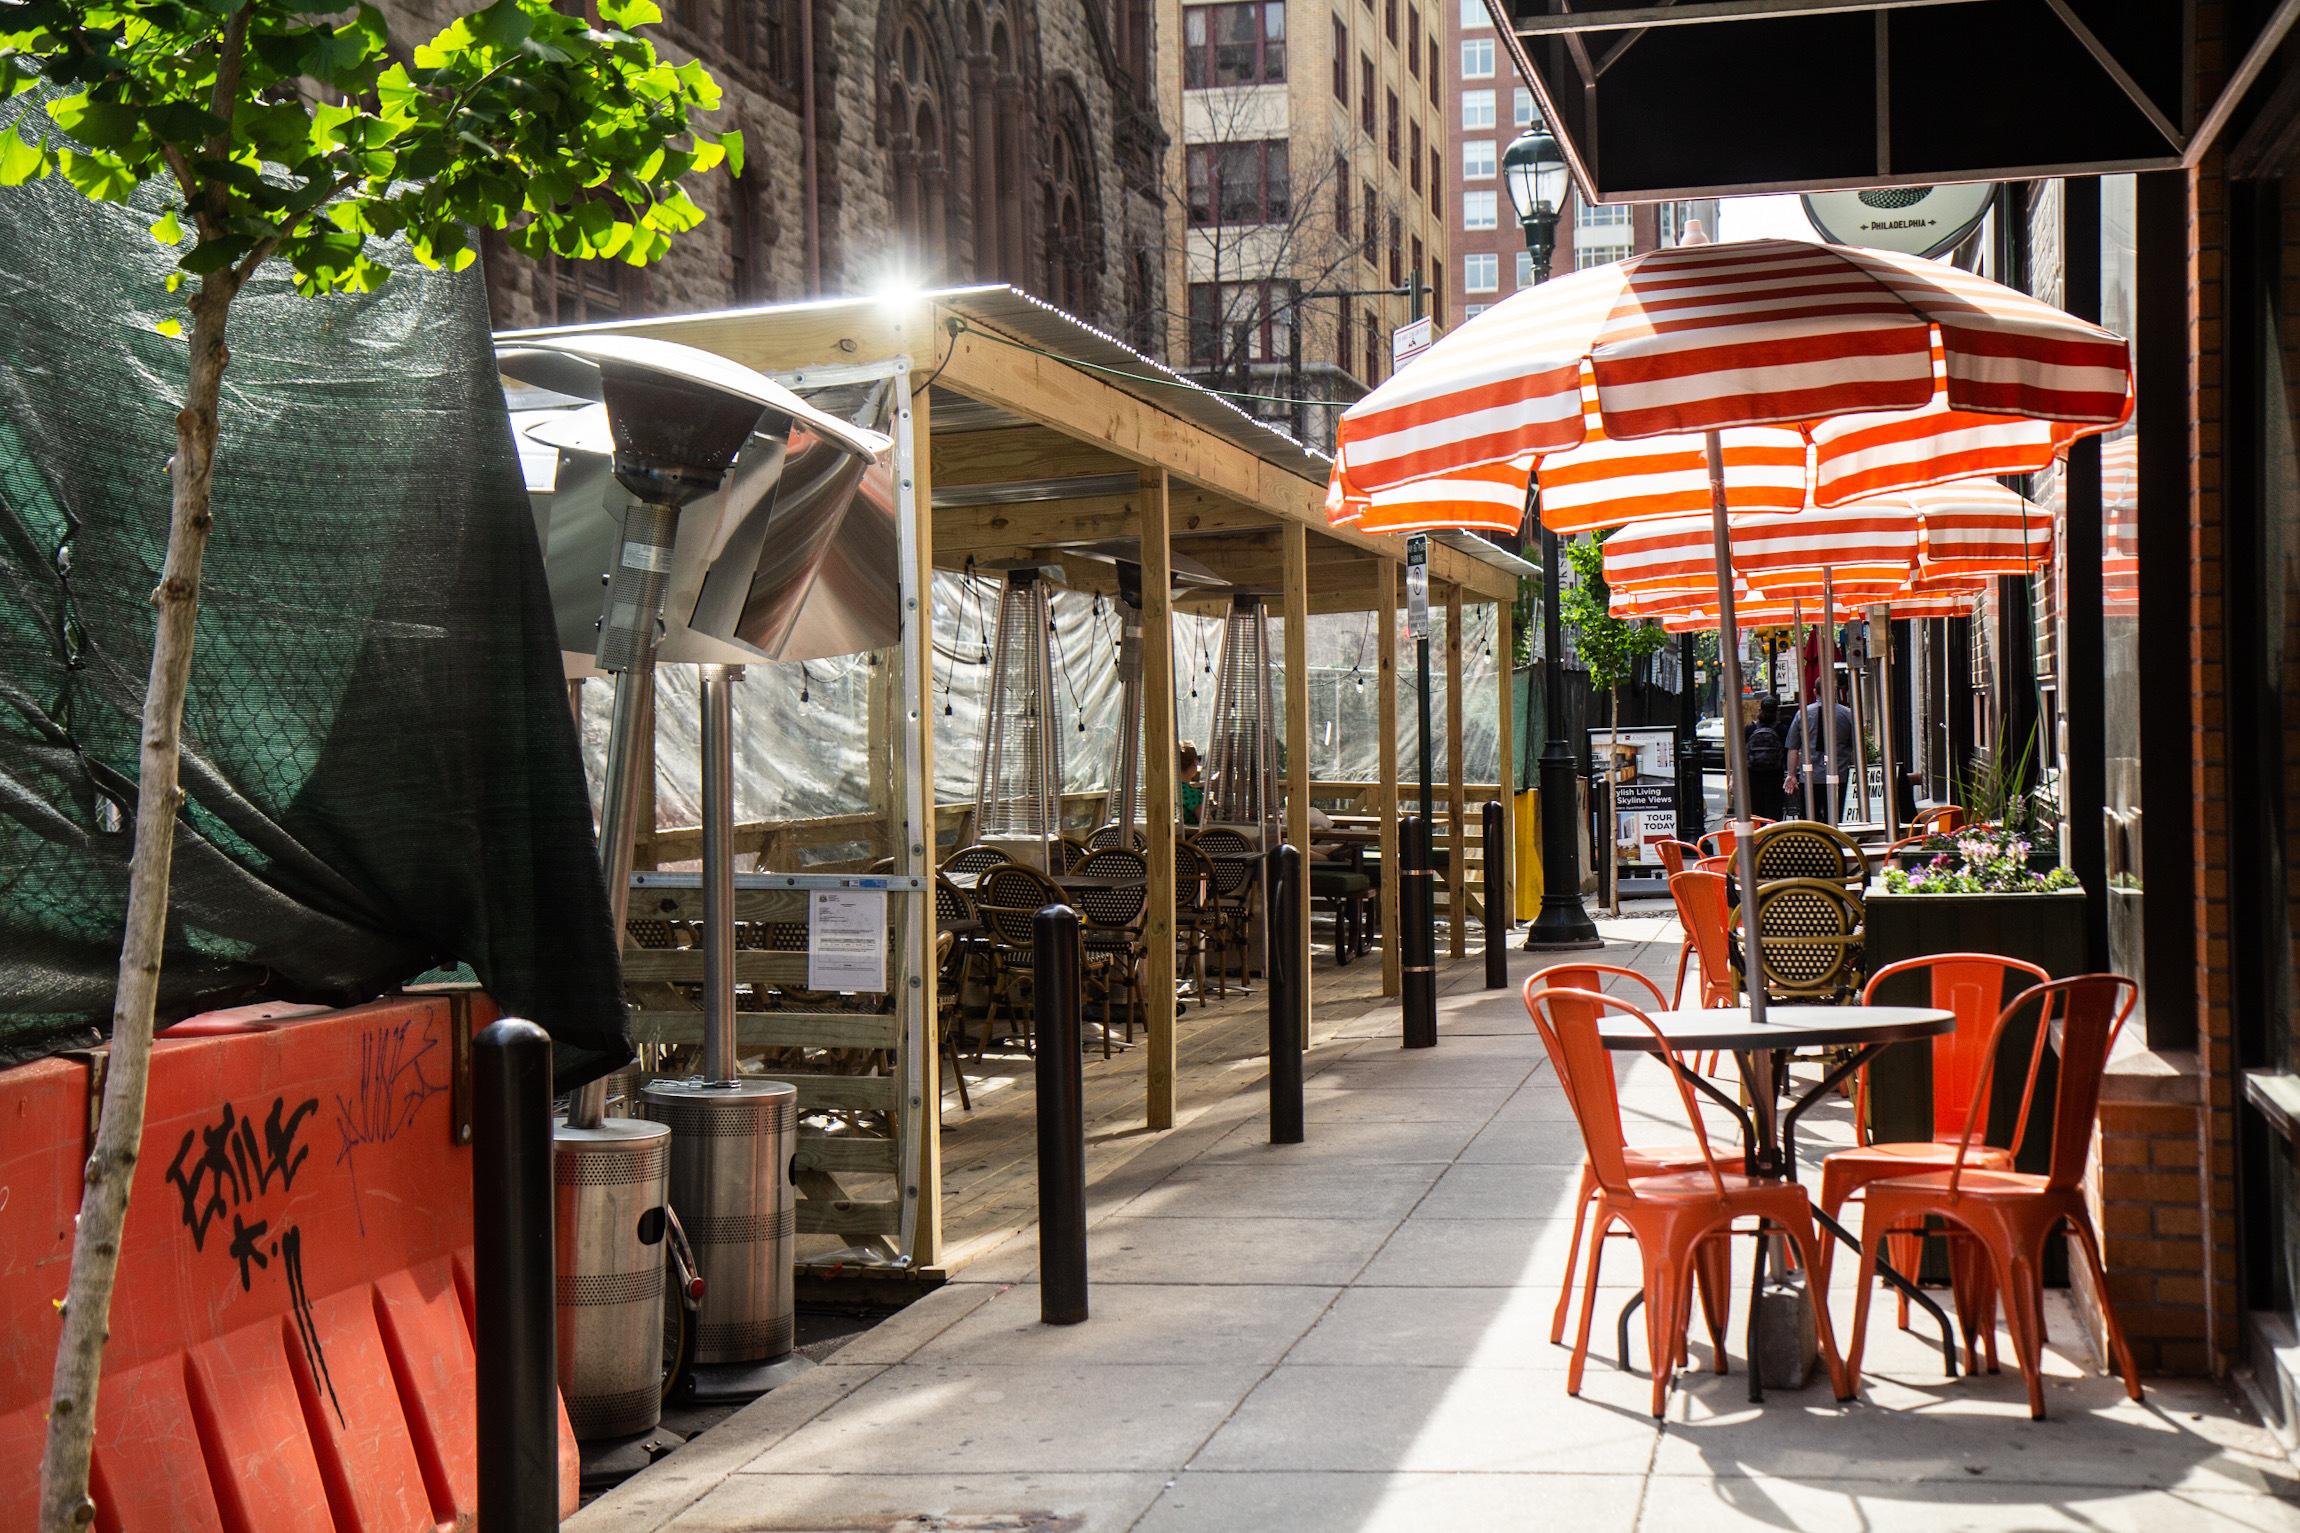 Dining on the 1600 block of Sansom Street in Center City Philadelphia. (Kimberly Paynter/WHYY)